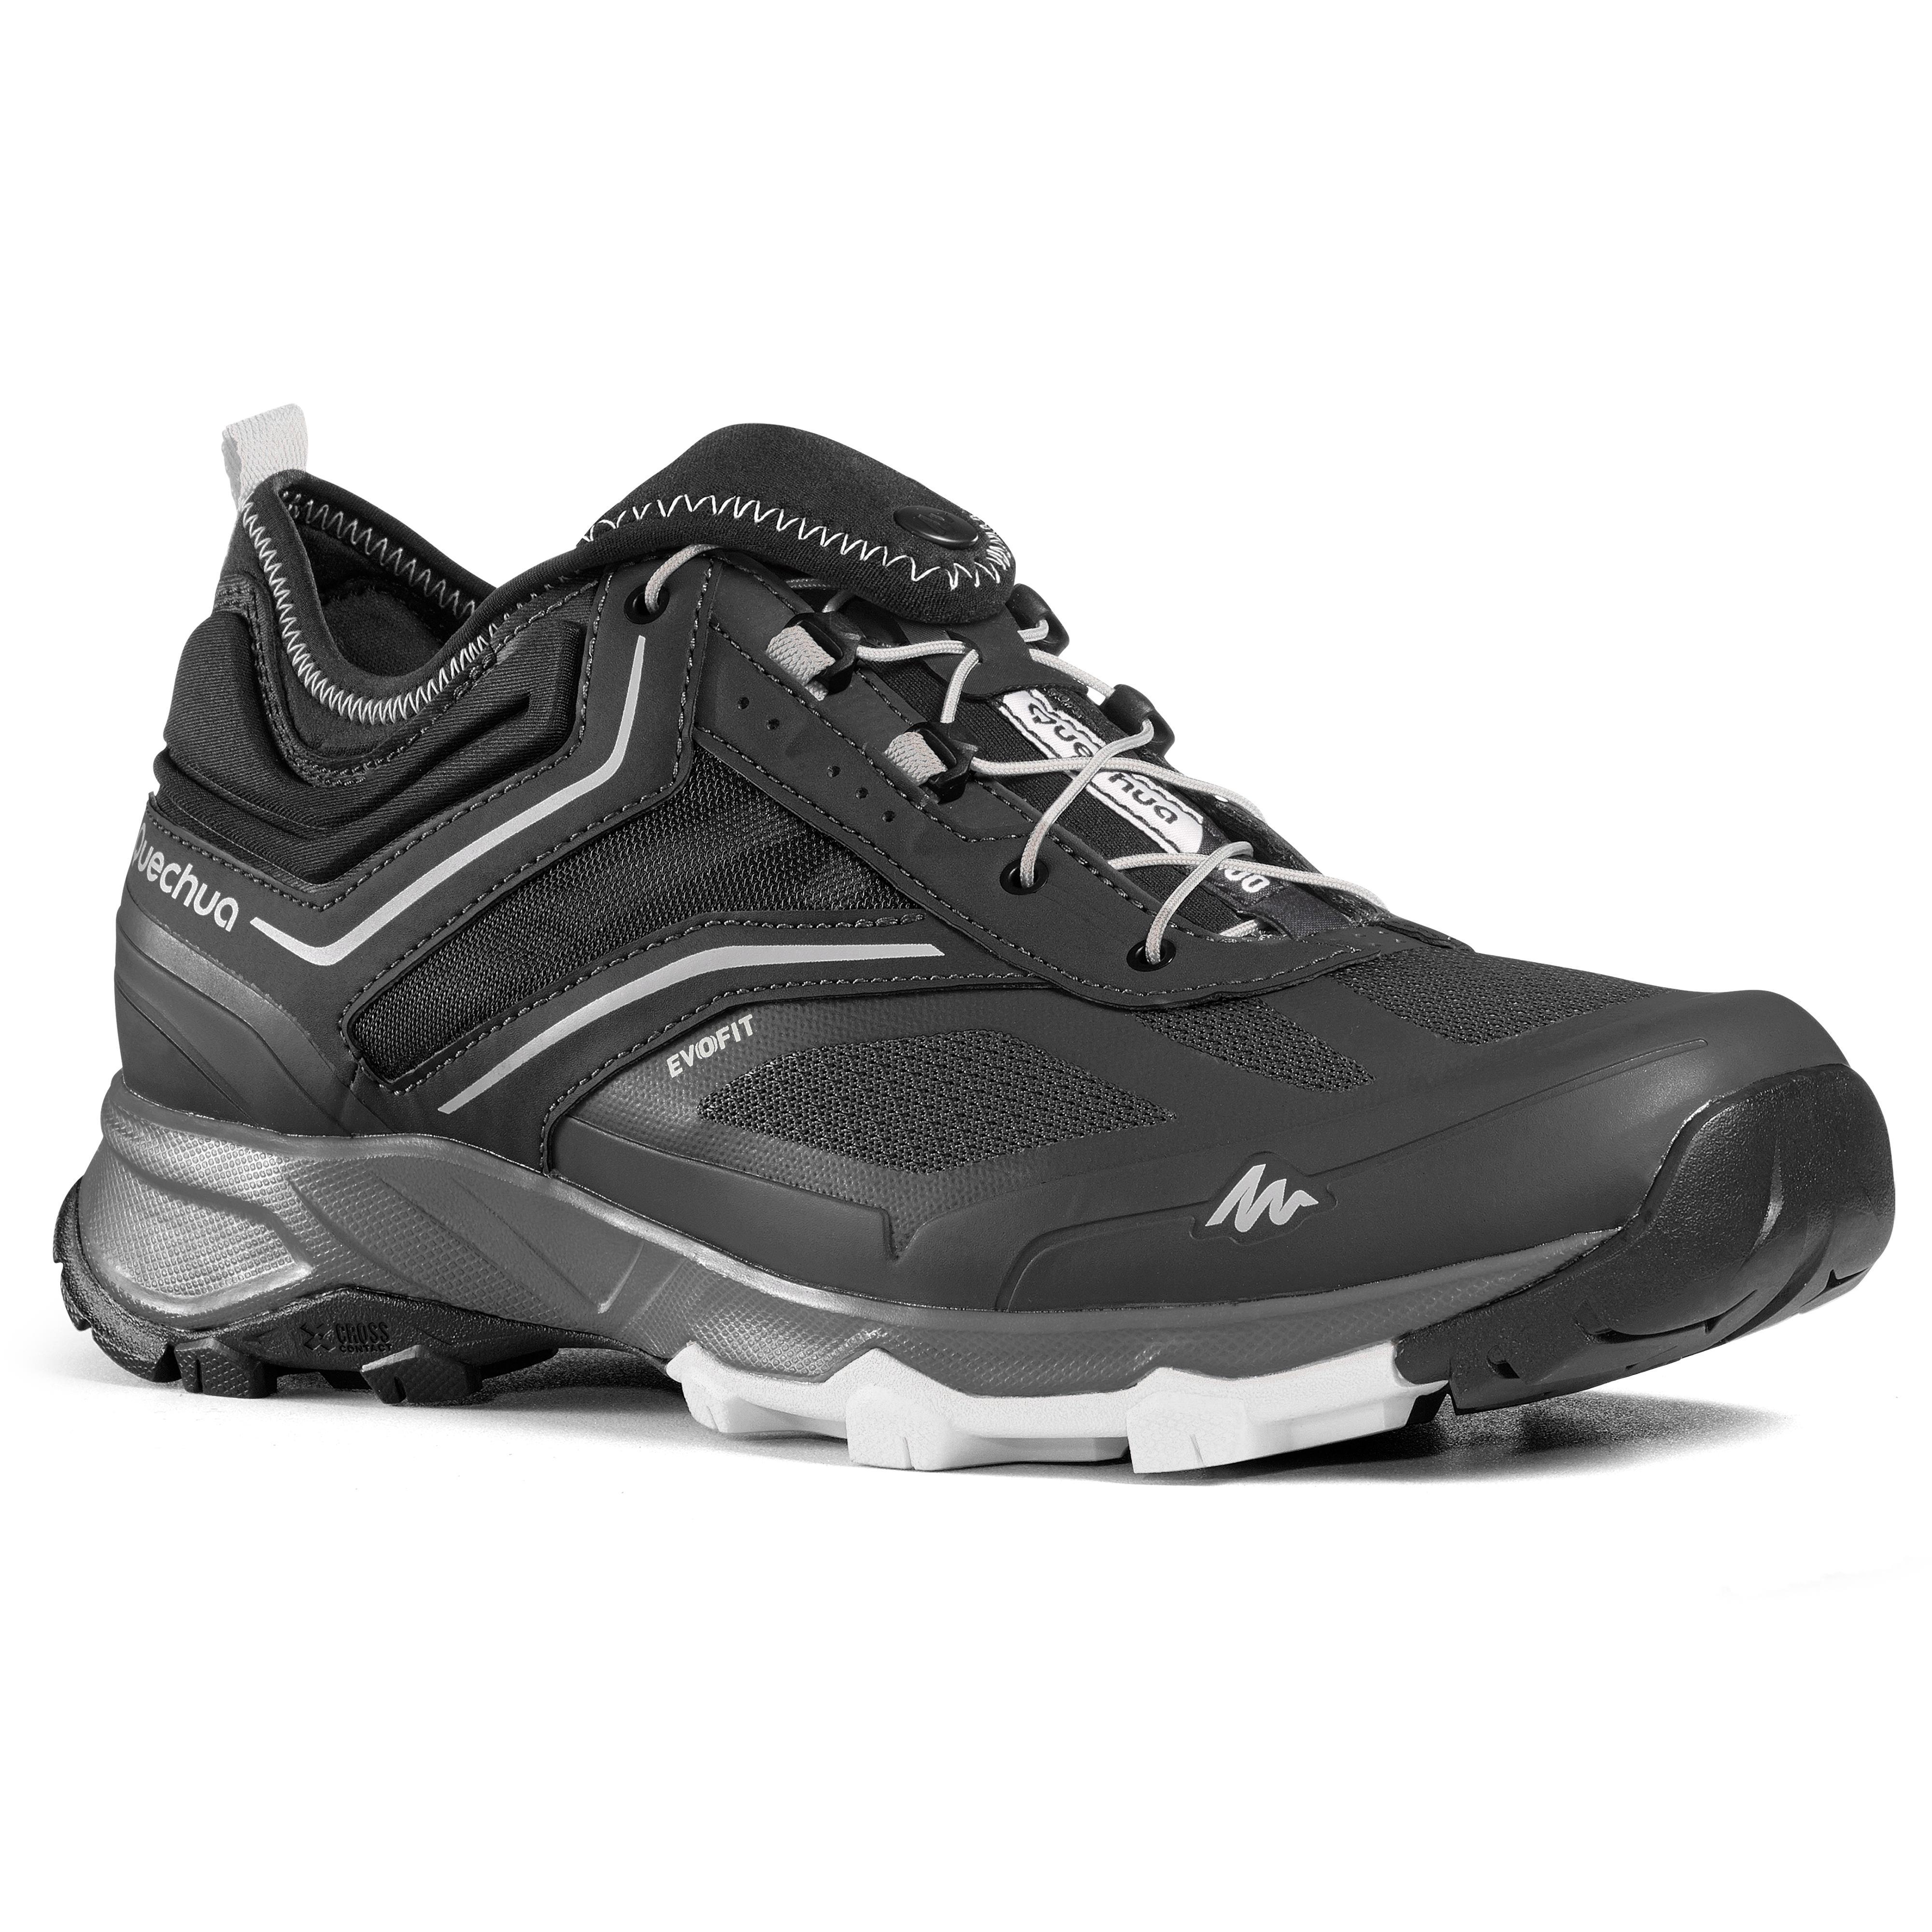 FH500 Helium men's hiking shoes - Decathlon